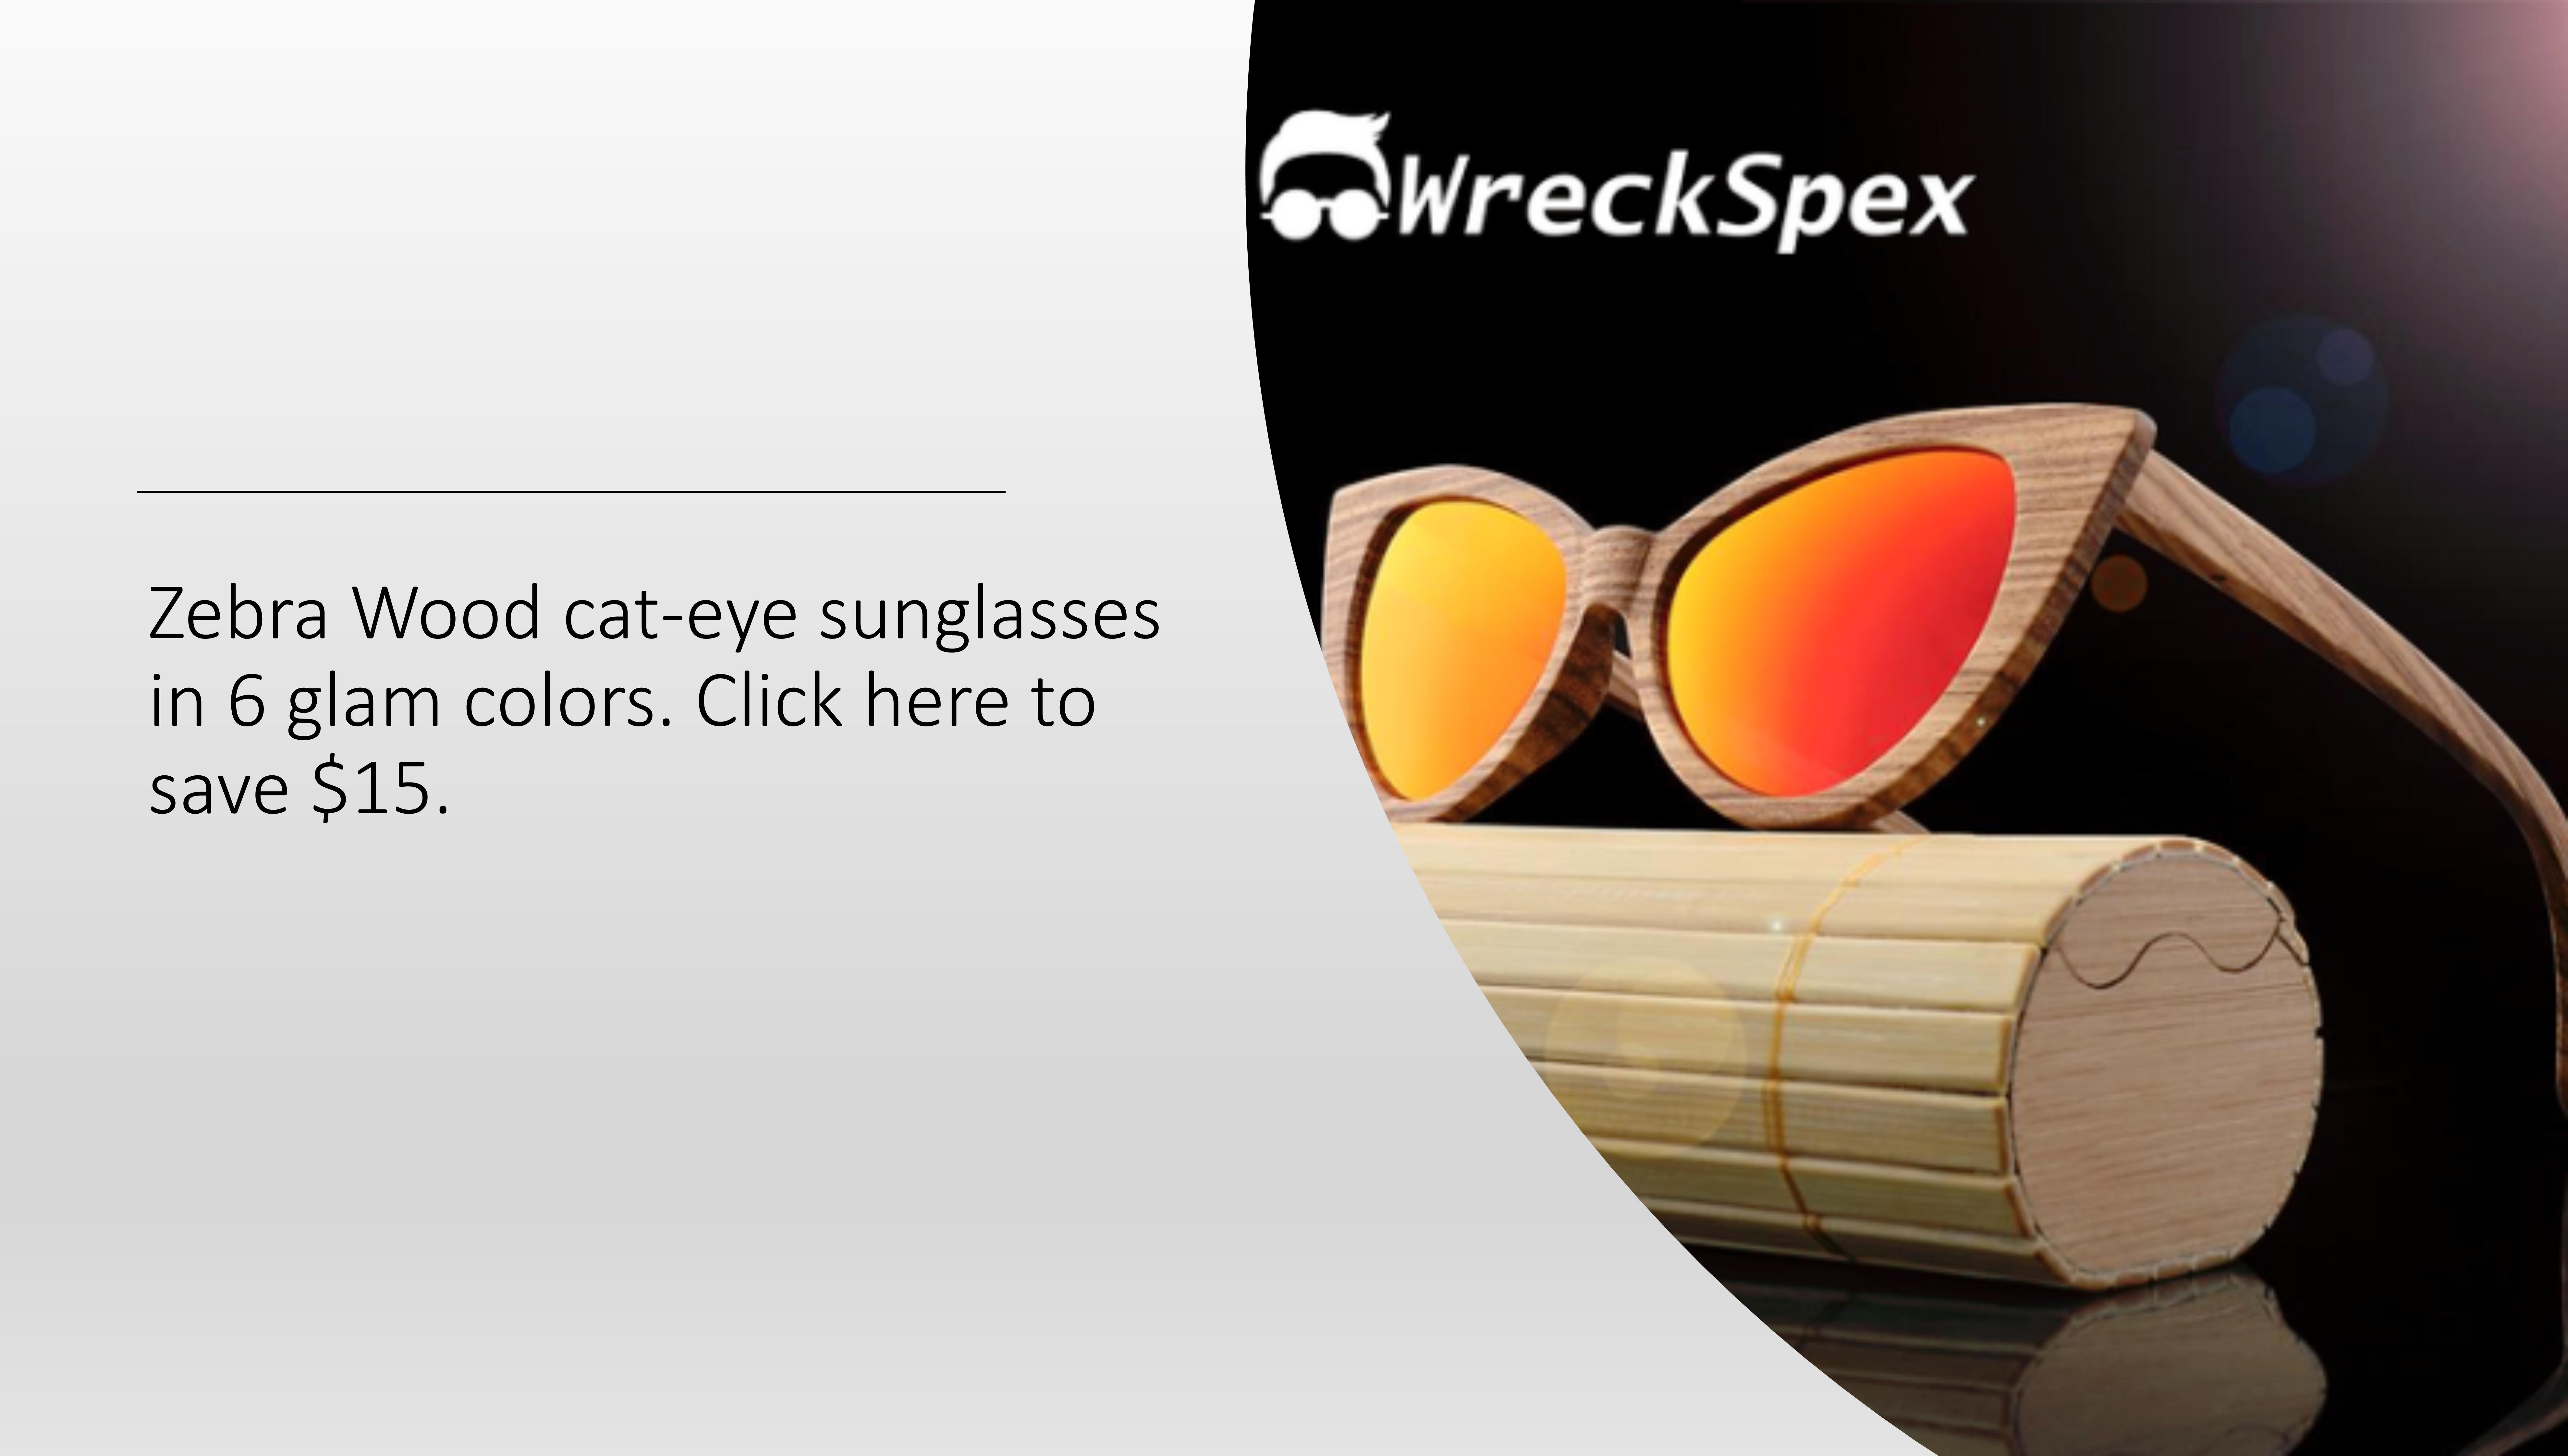 WreckSpex Zebra wood